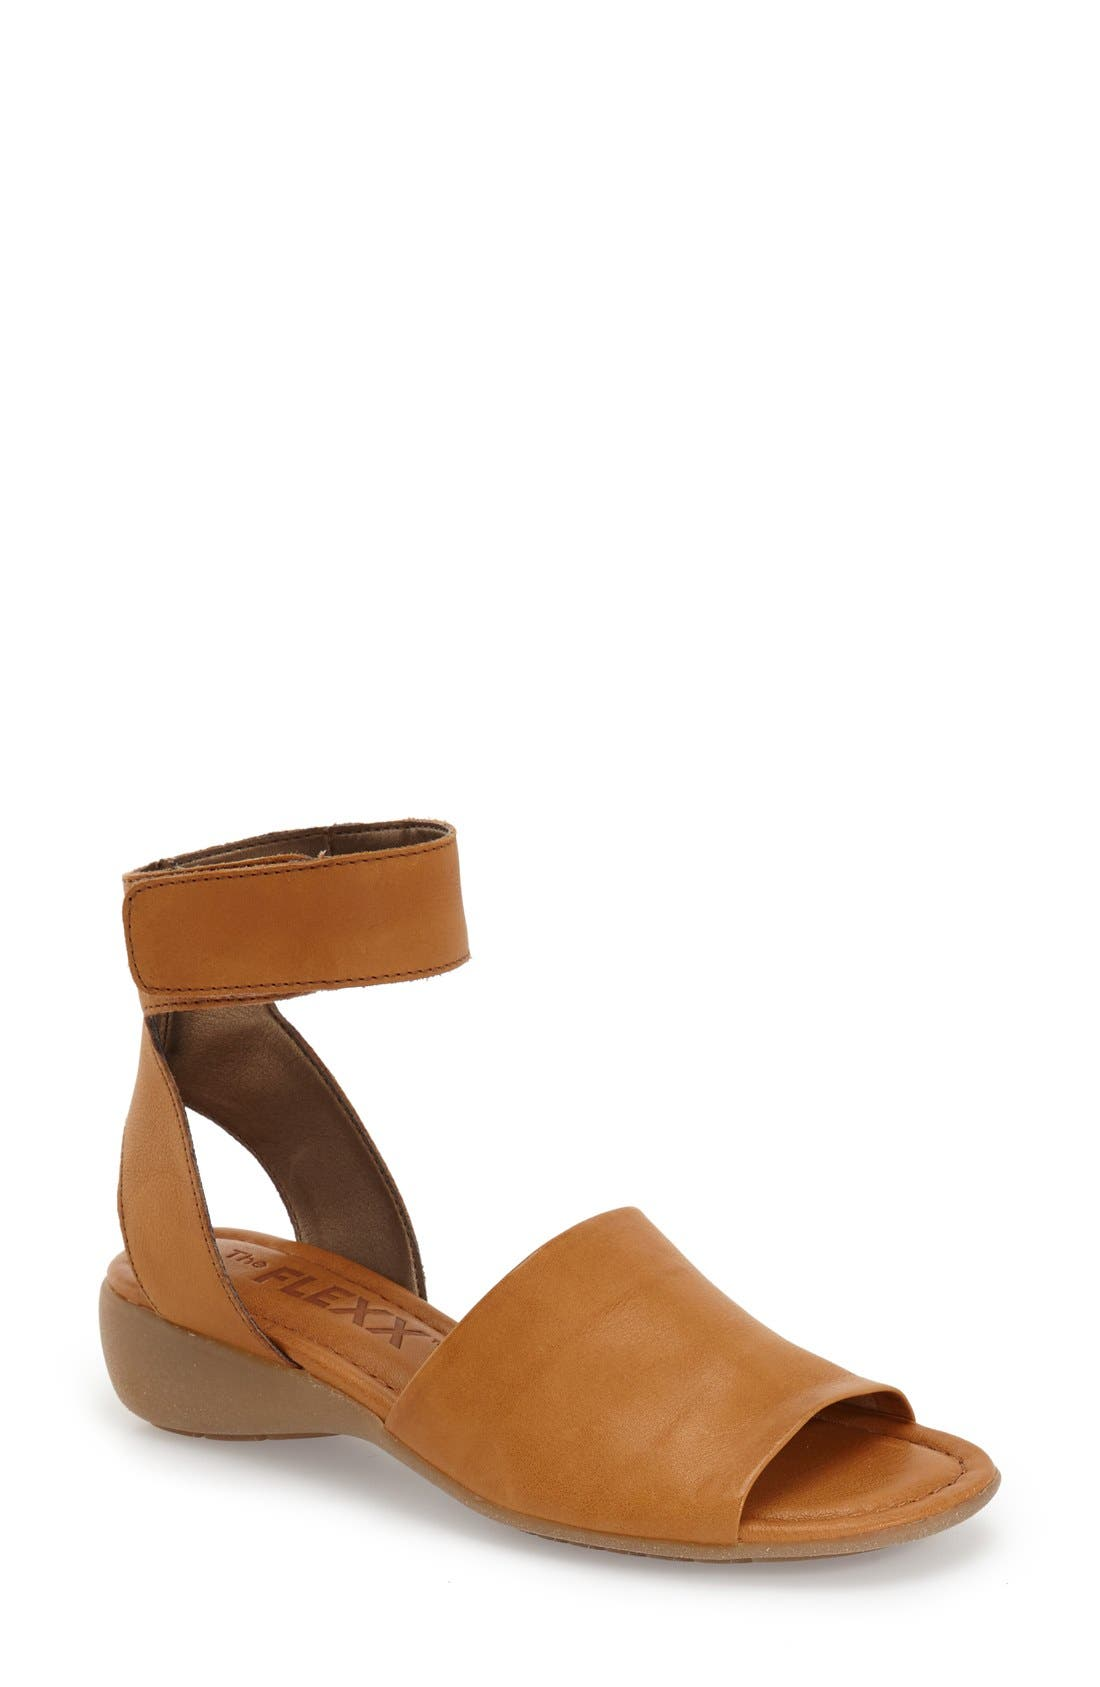 'Beglad' Leather Ankle Strap Sandal,                             Main thumbnail 12, color,